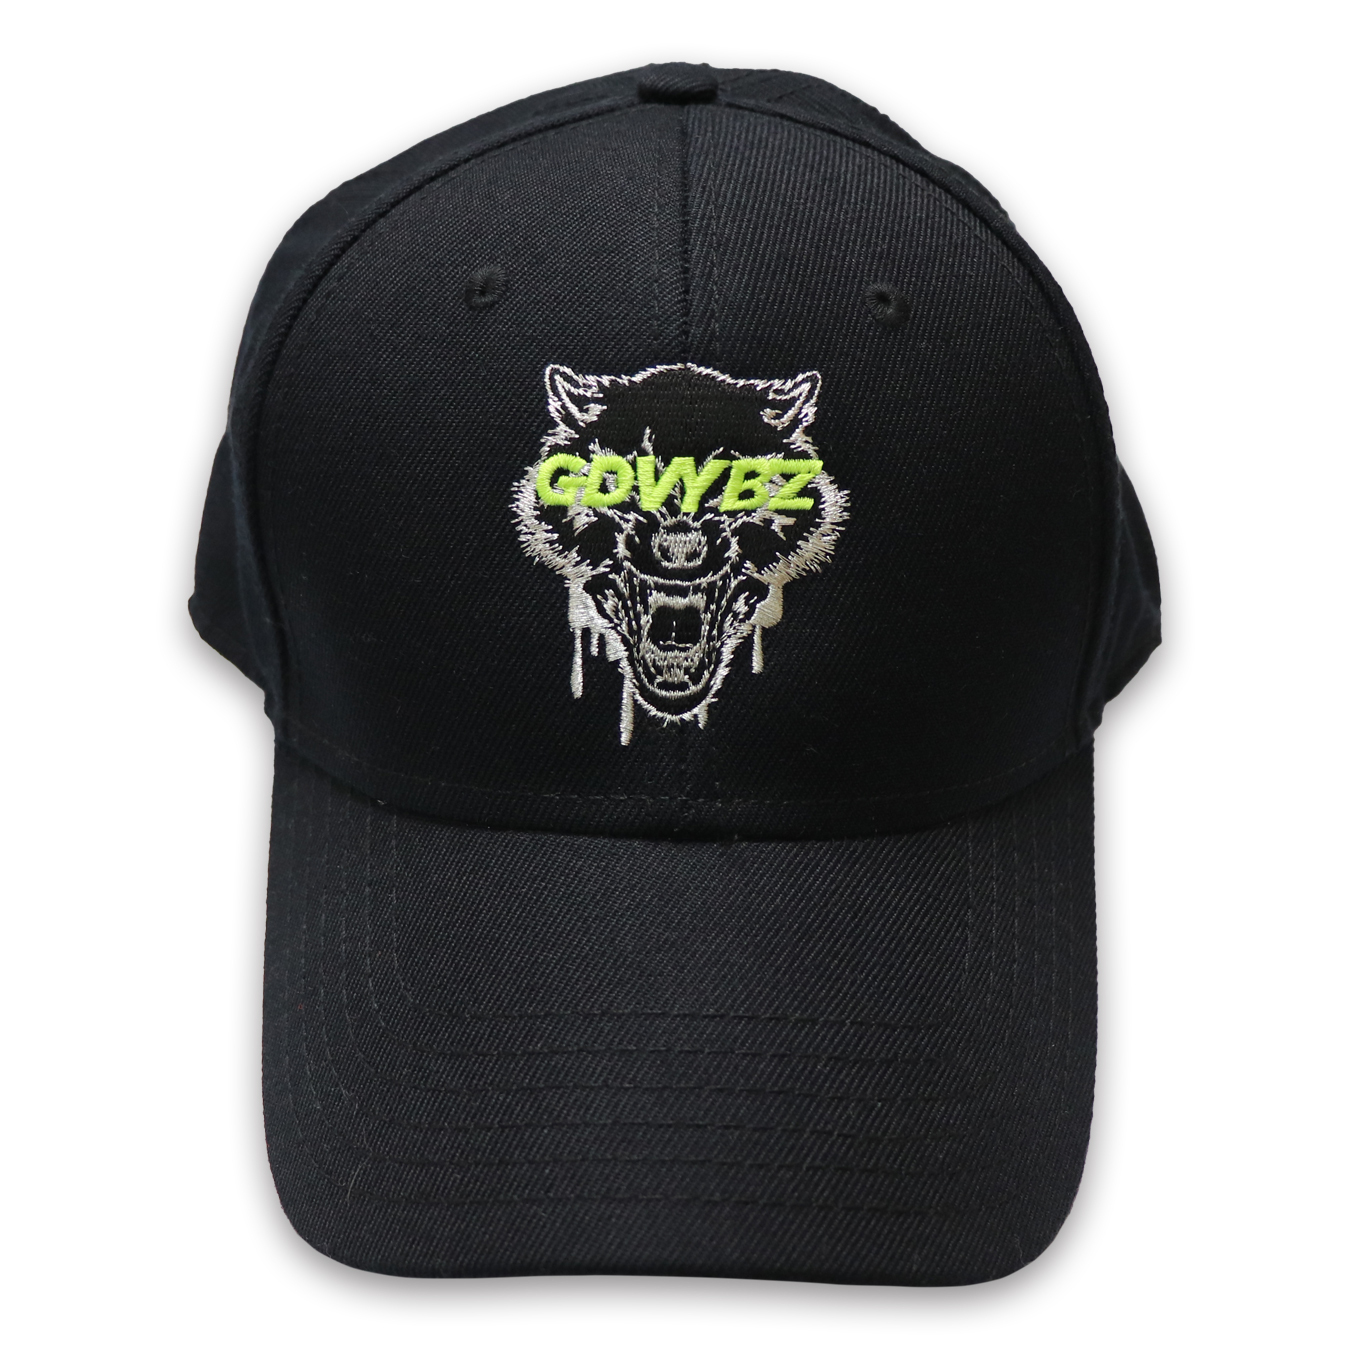 GDVYBZ RELOADED WOLF CAP - BLACK